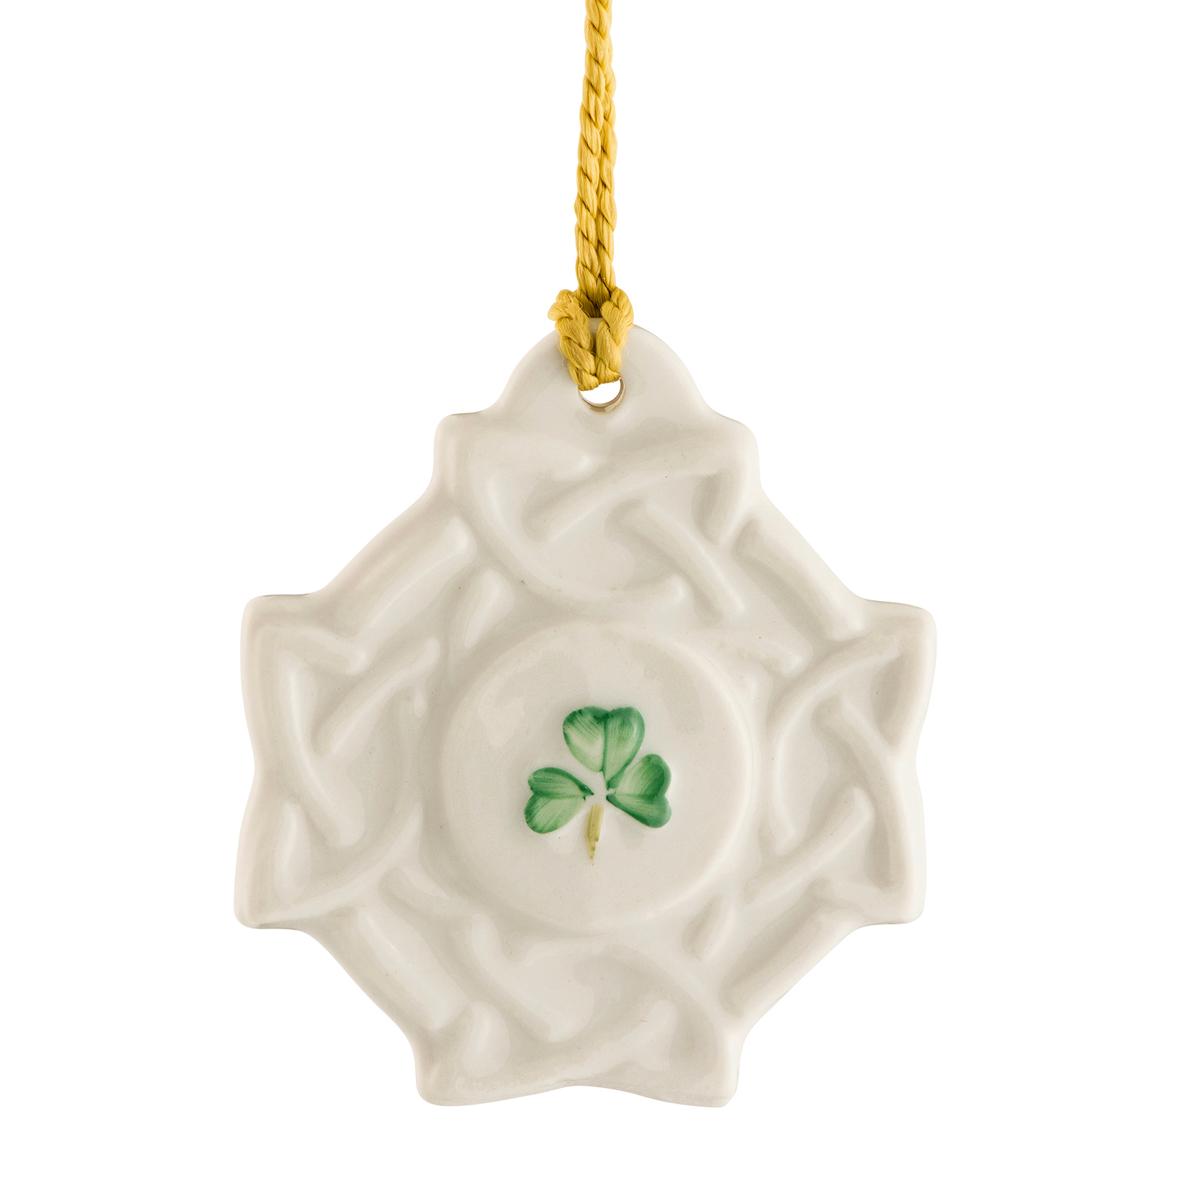 Belleek China Celtic Knot Ornament